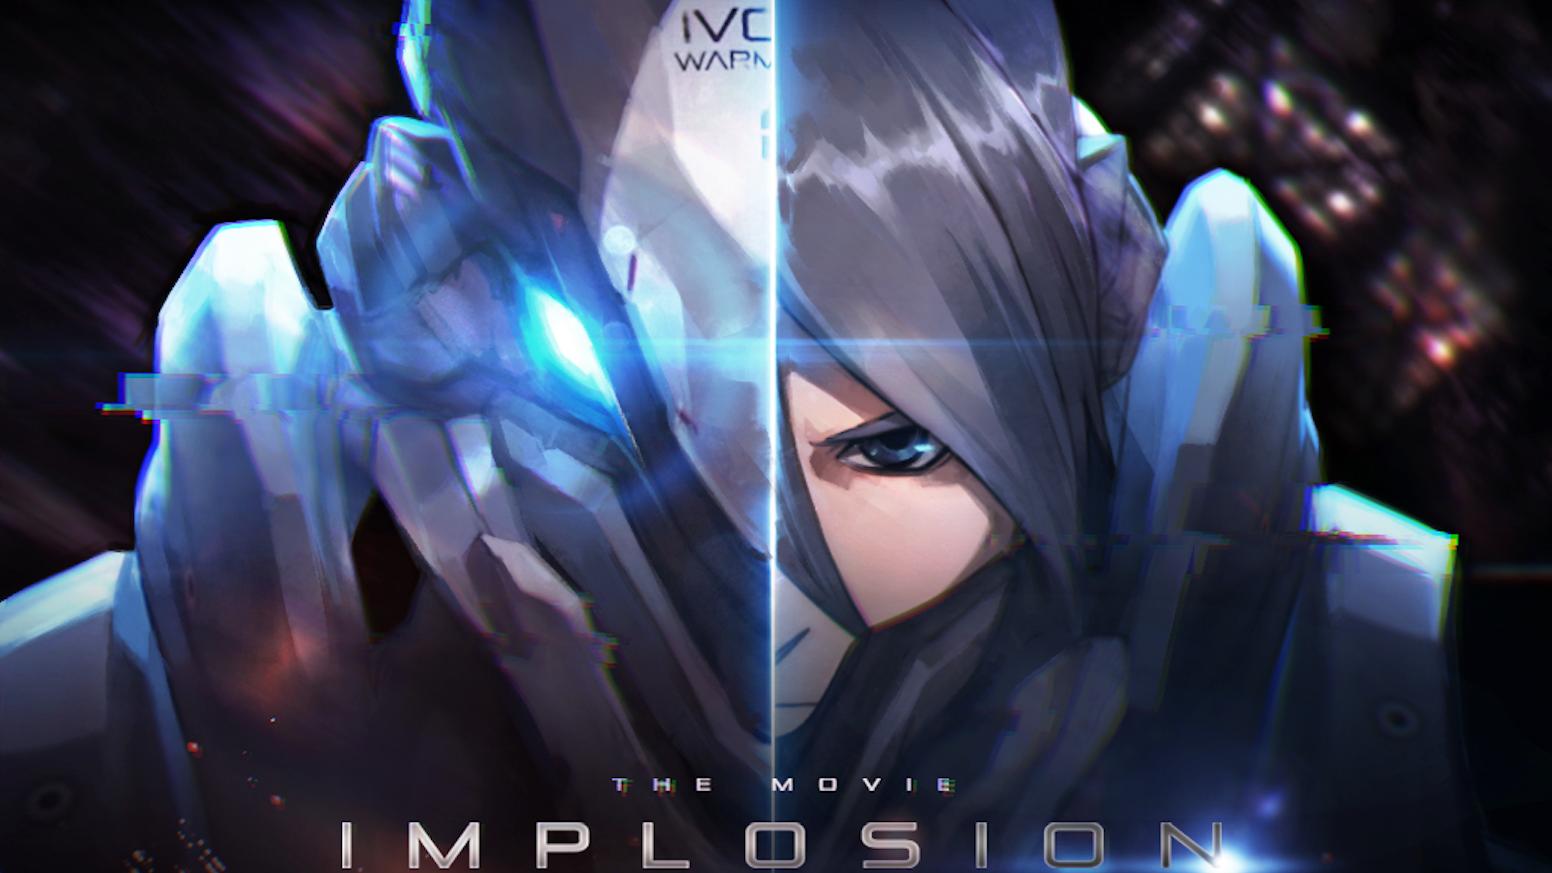 implosion 1.2 12 full version apk